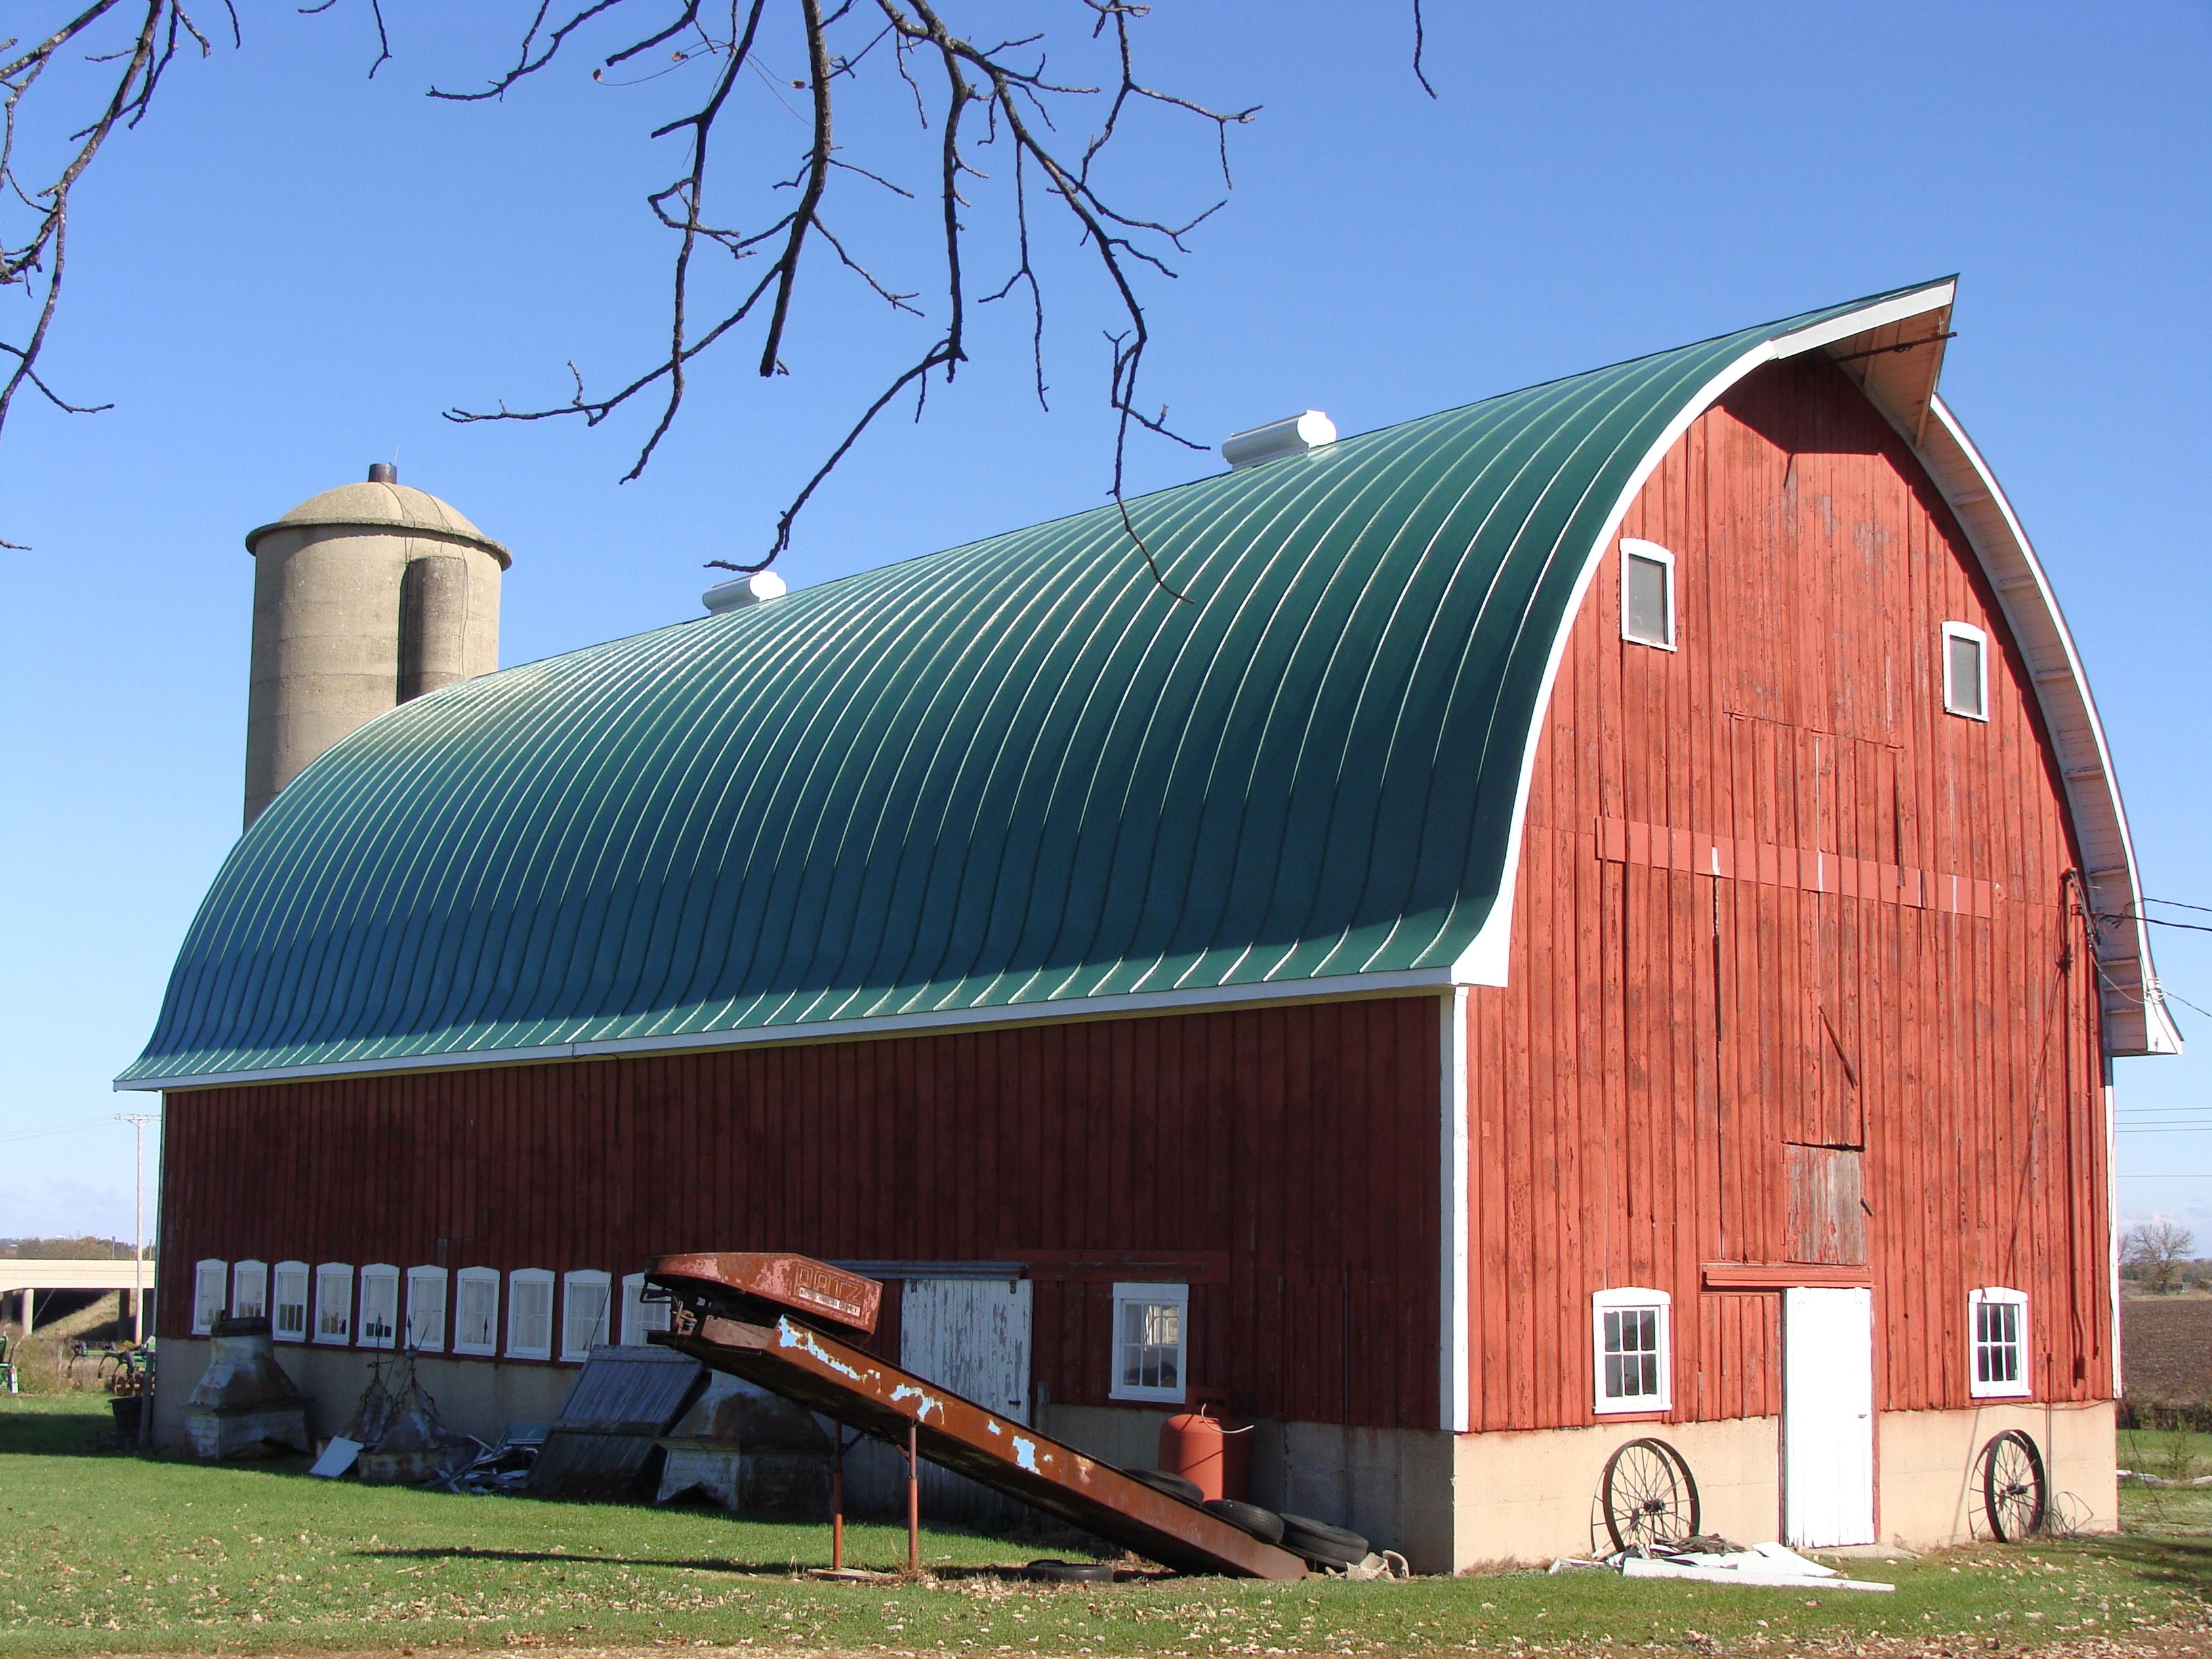 double lock standing seam sheet metal roofing gothic barn agricultural teal green blue culpitt wisconsin illinois iowa minnesota north dakota